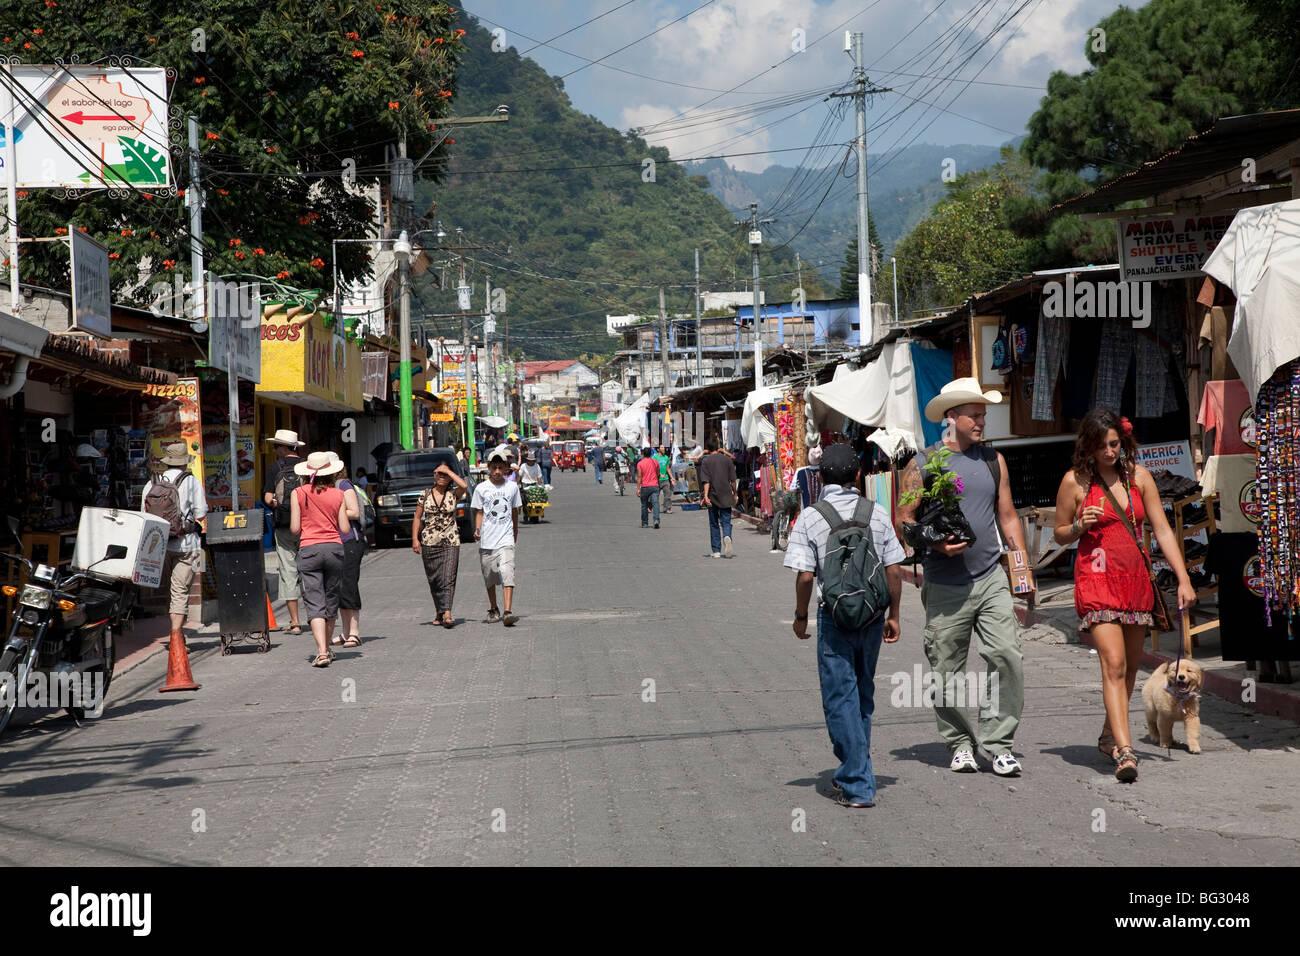 Calle Santander Panajachel Lake Atitlan Guatemala. - Stock Image